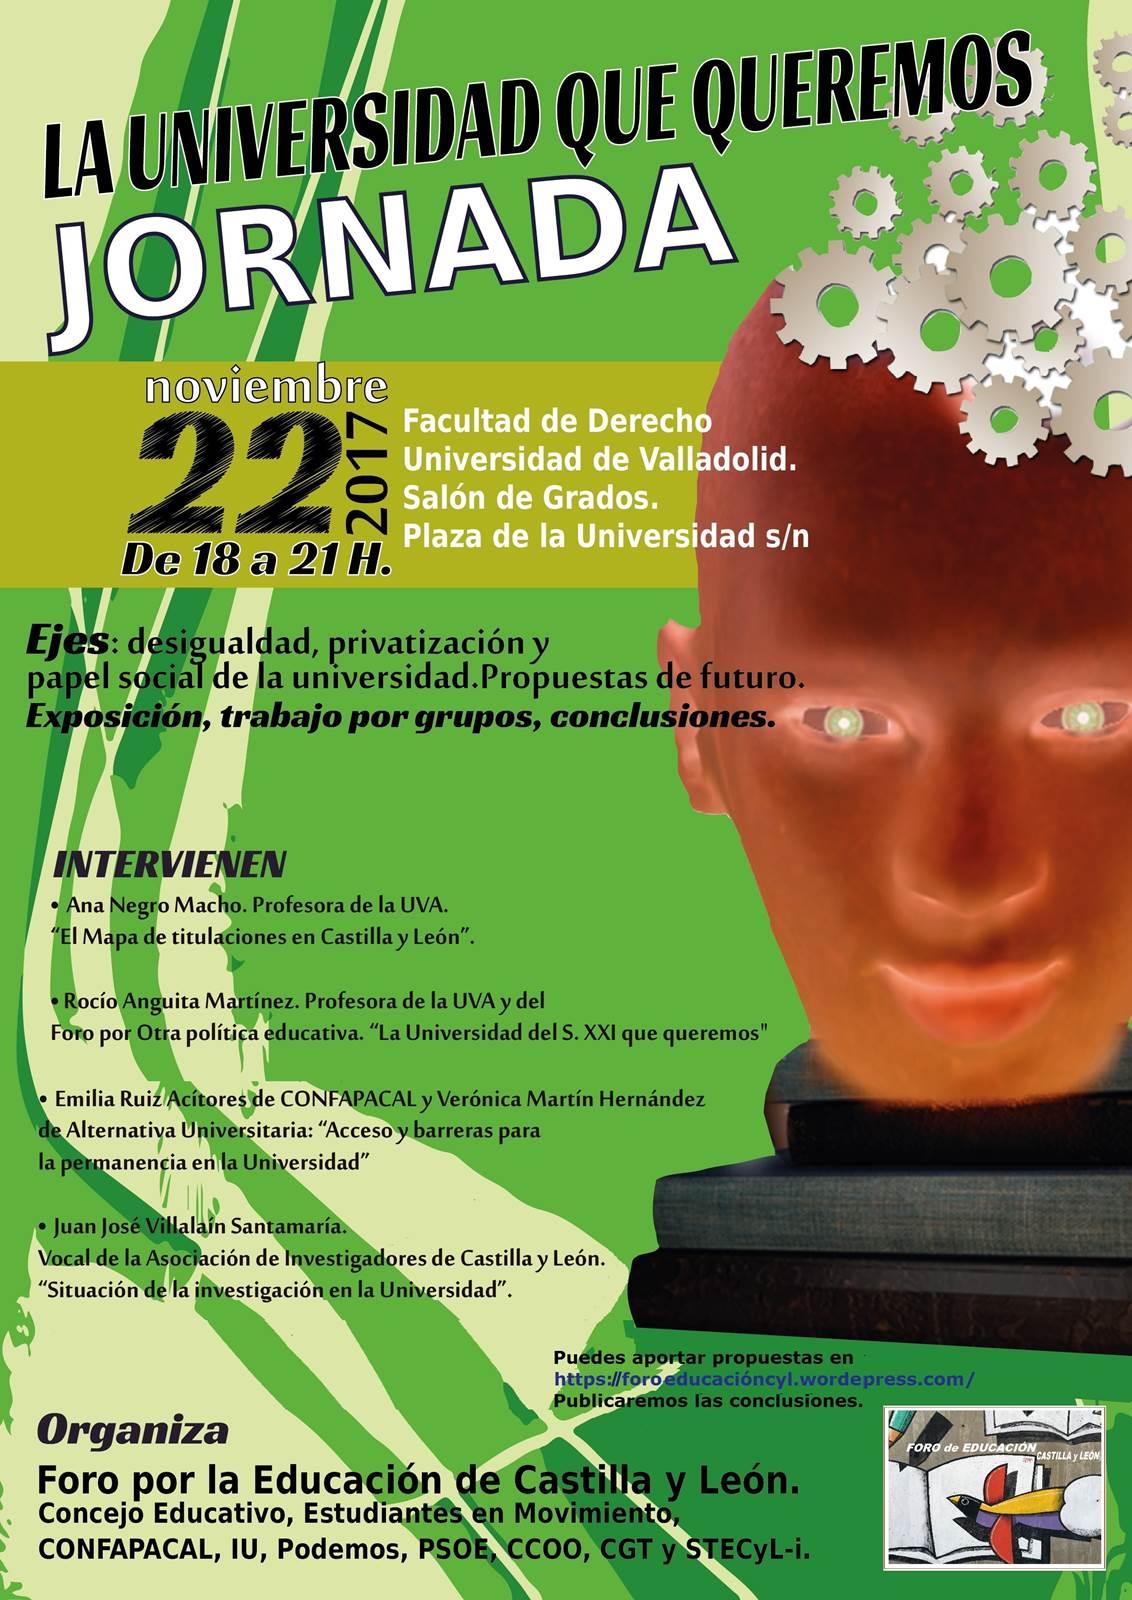 Jornadas-La-Universidad-Que-Queremos-VA2017